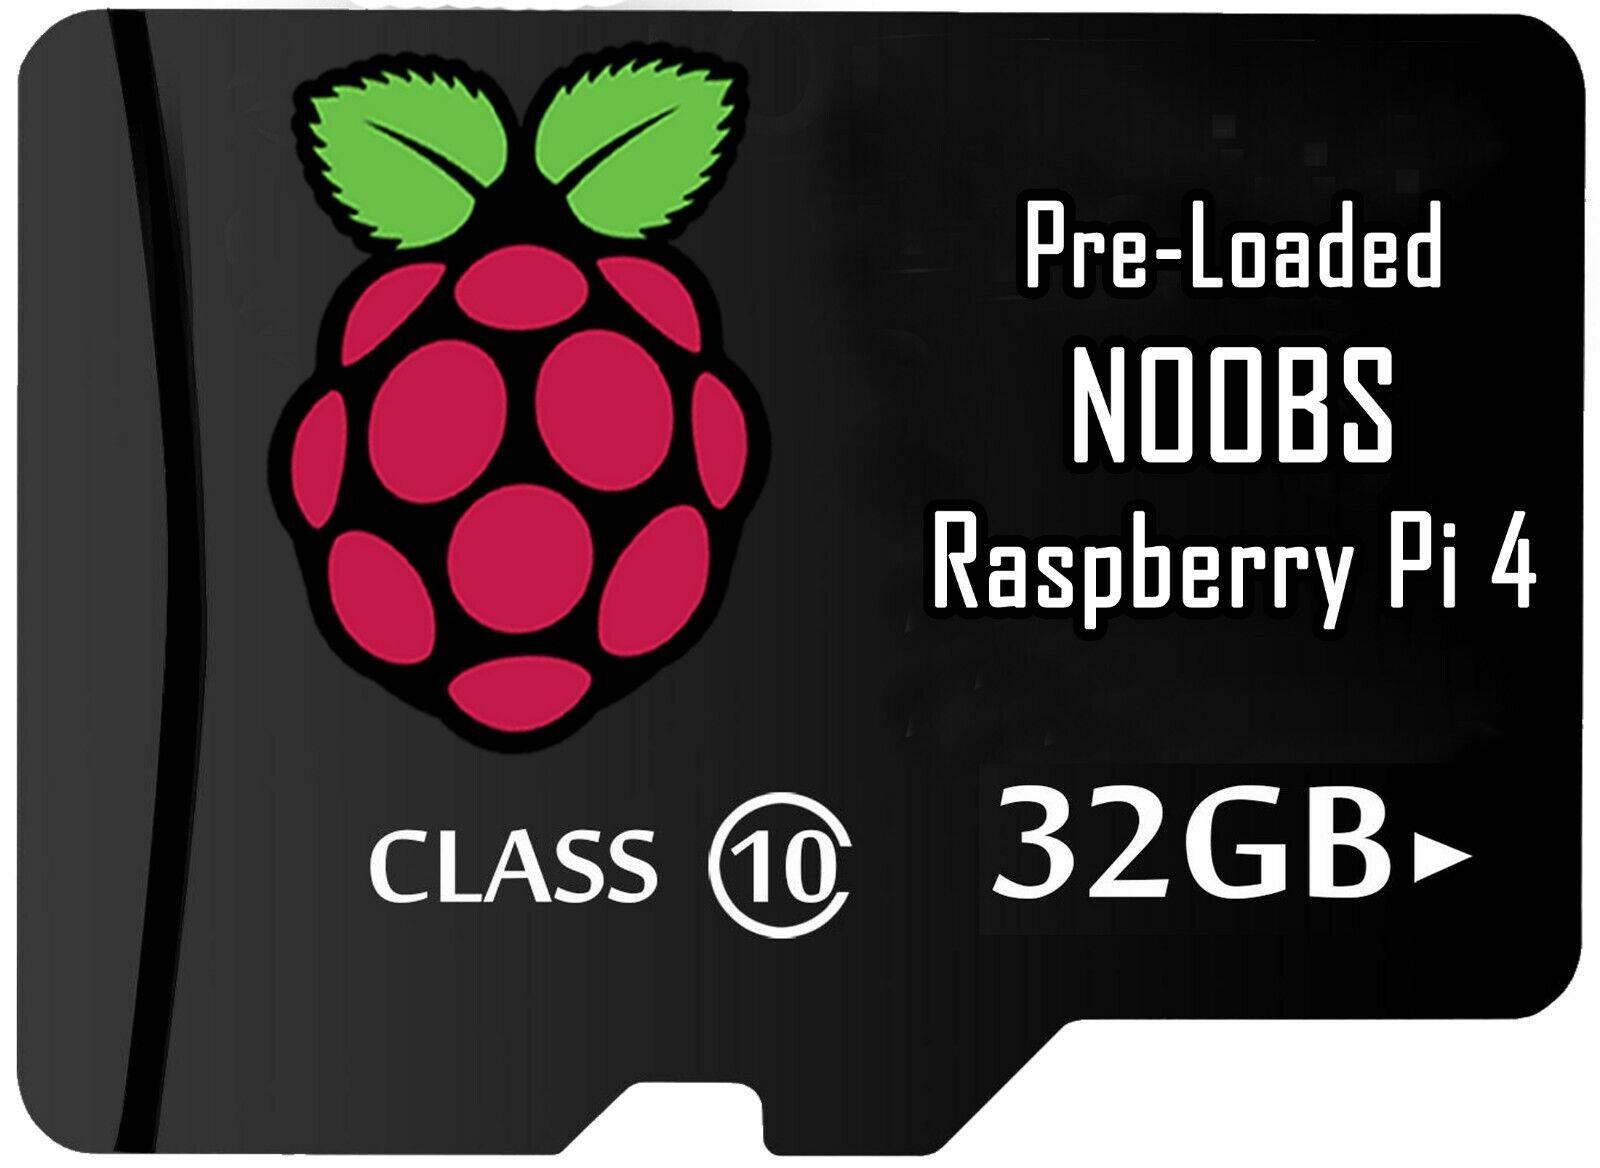 noobs sd card preloaded 32gb rasberry pi